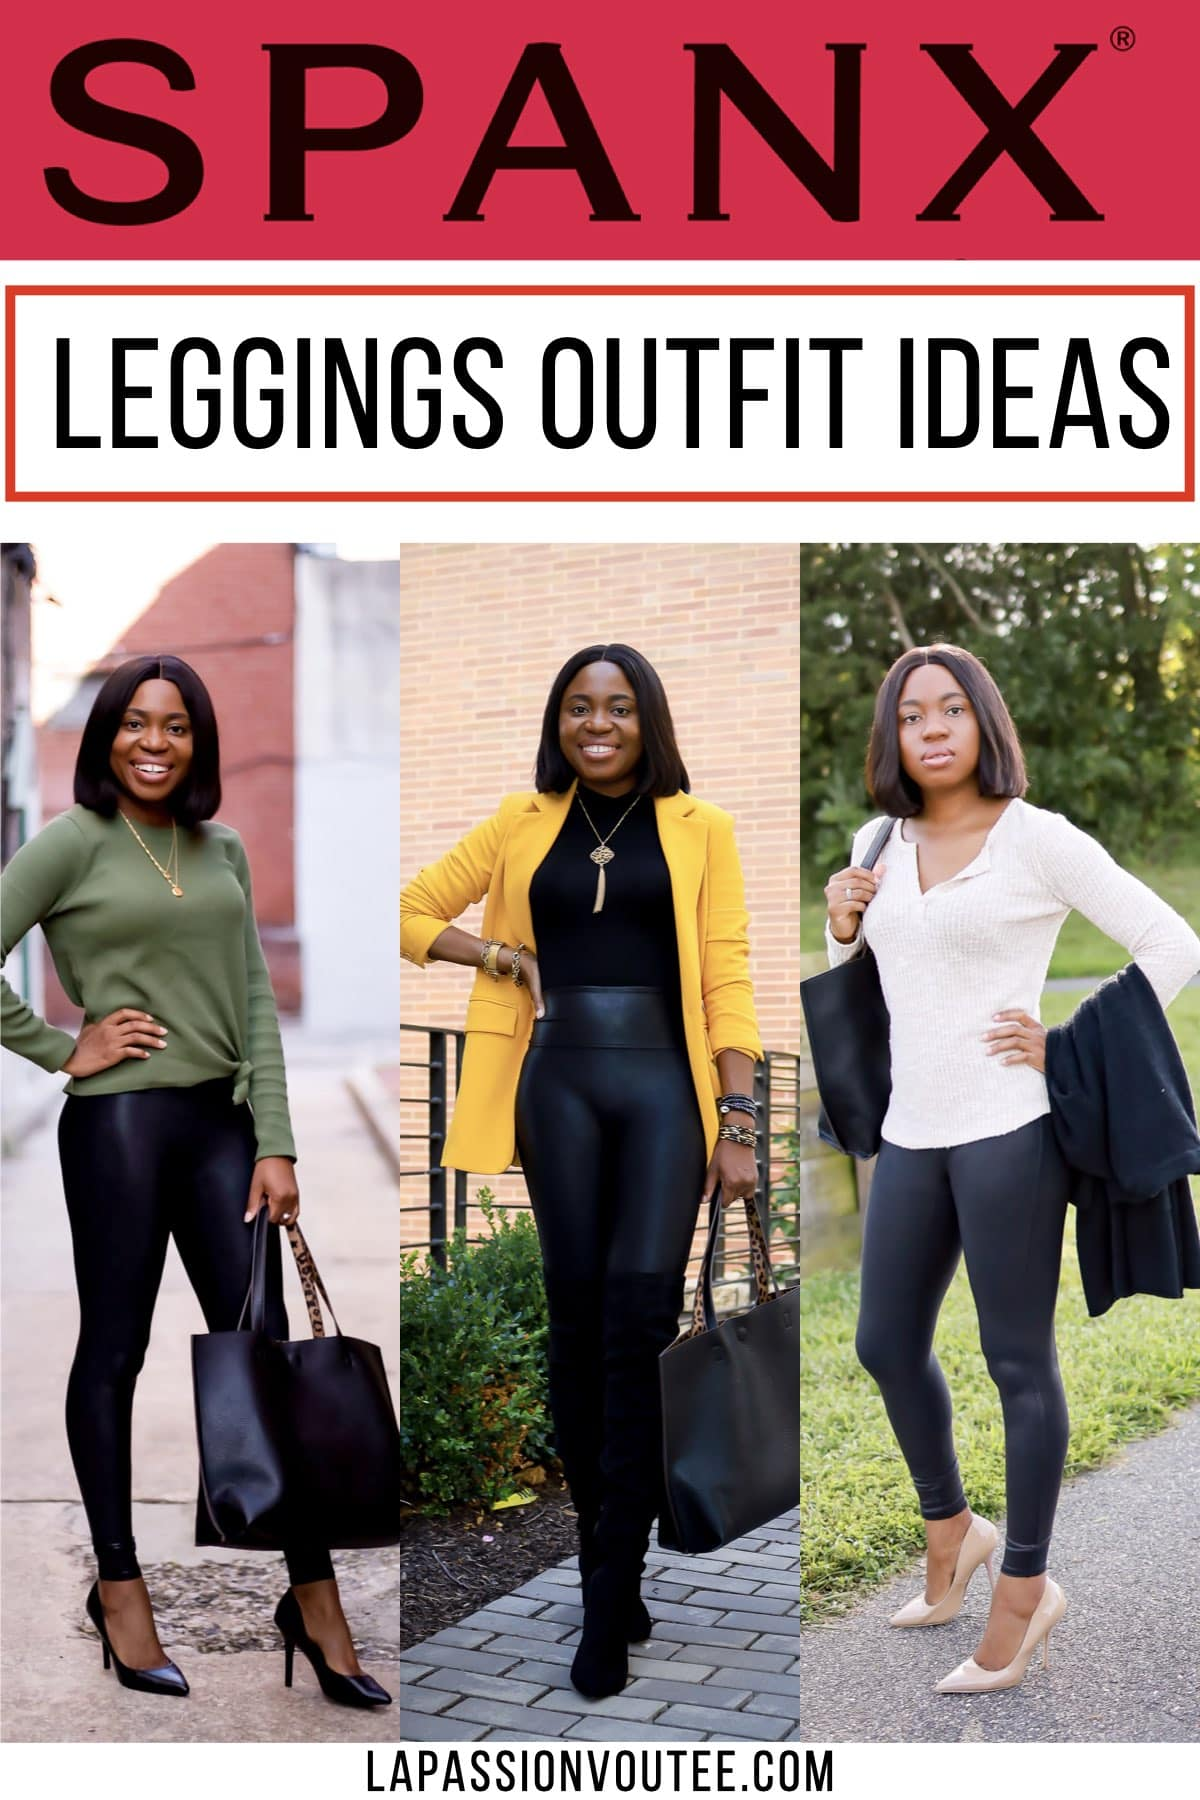 Spanx faux leather leggings outfit ideas - 3 Easy Ways to wear Spanx this season